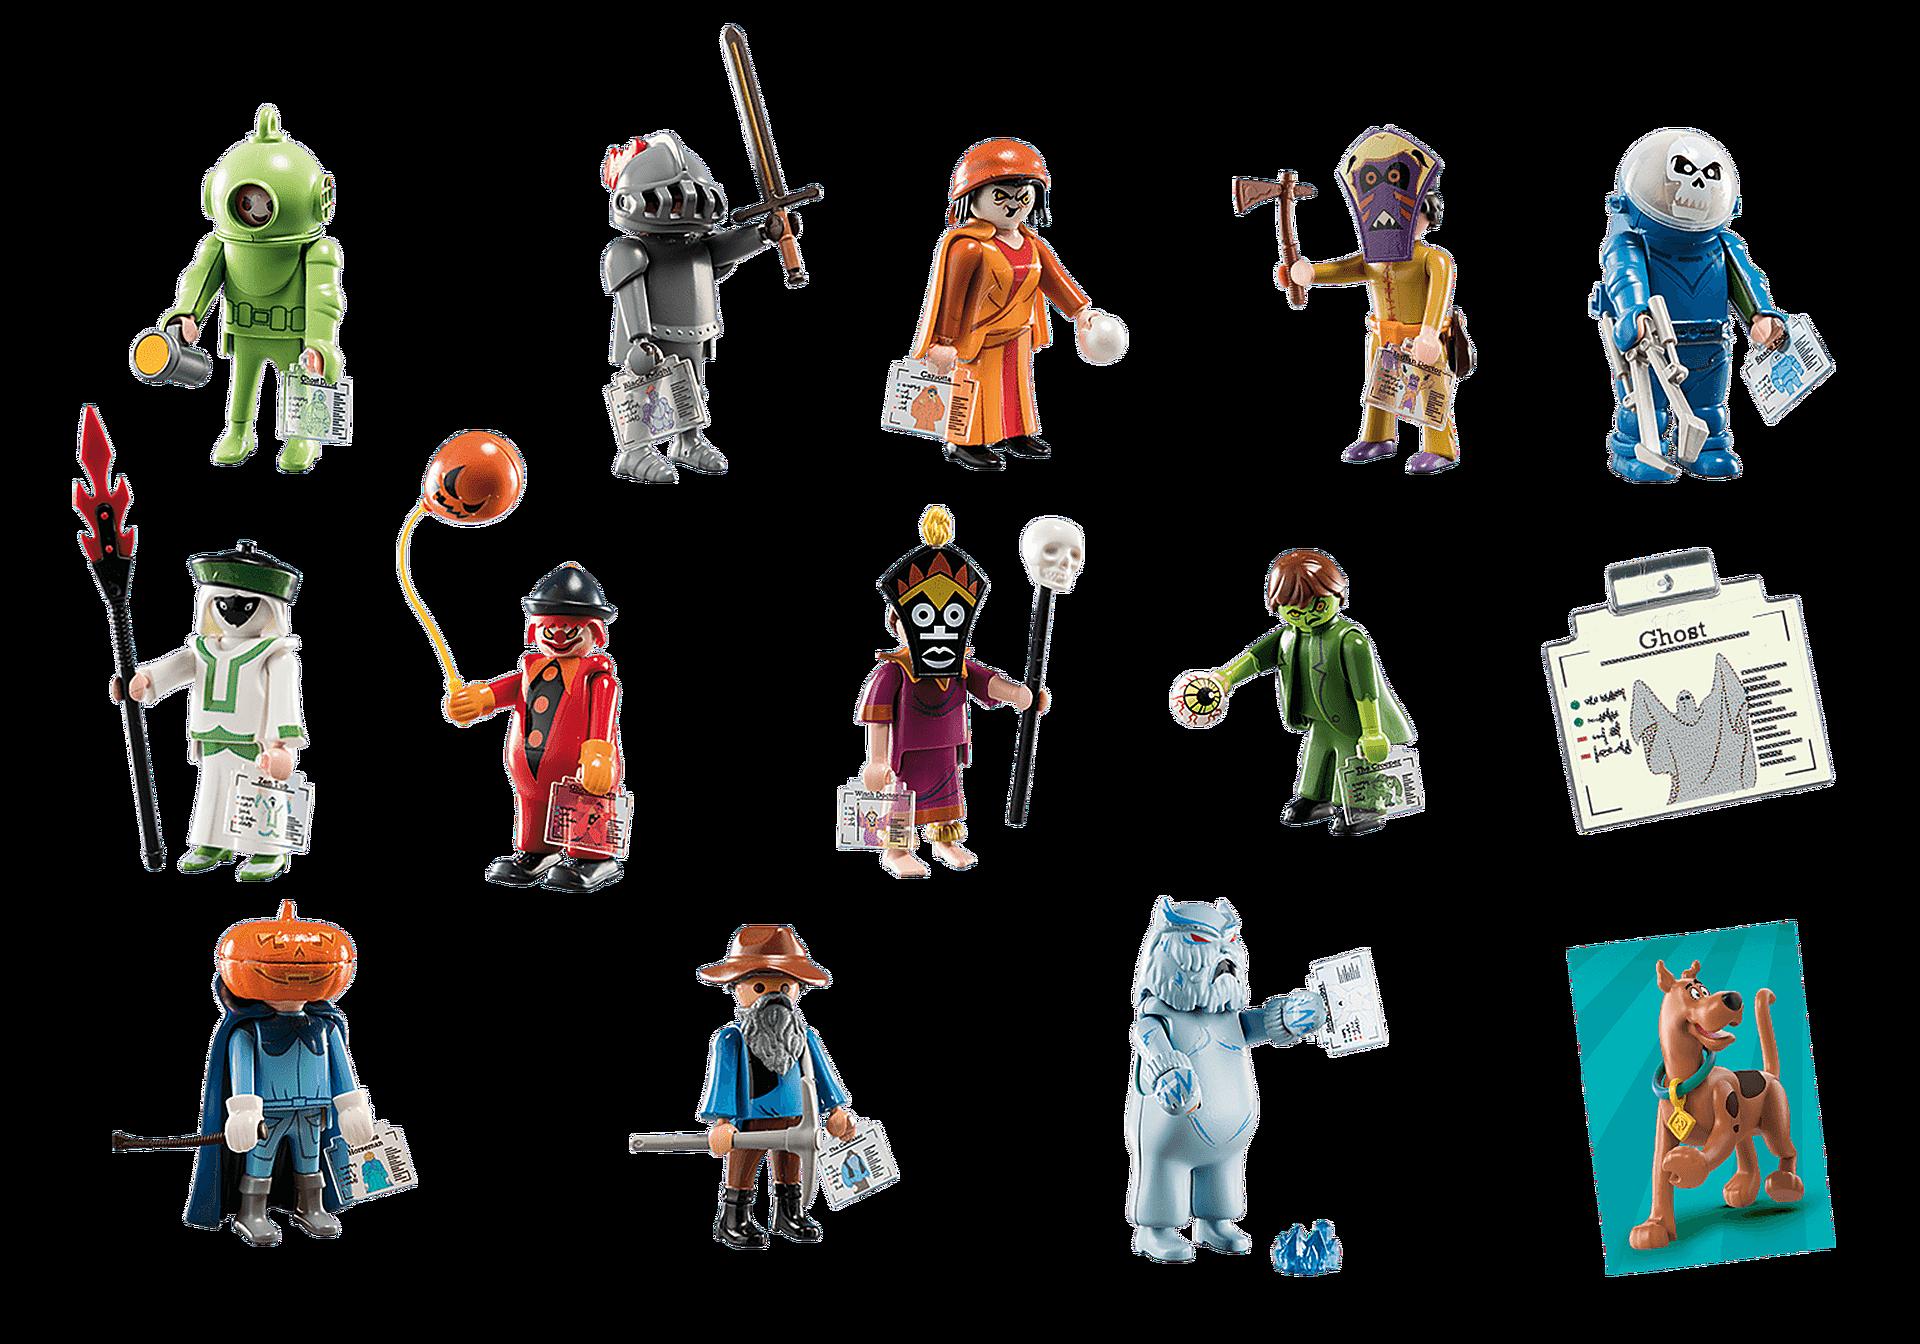 70288 SCOOBY-DOO! Mystery Figures (Series 1) zoom image4